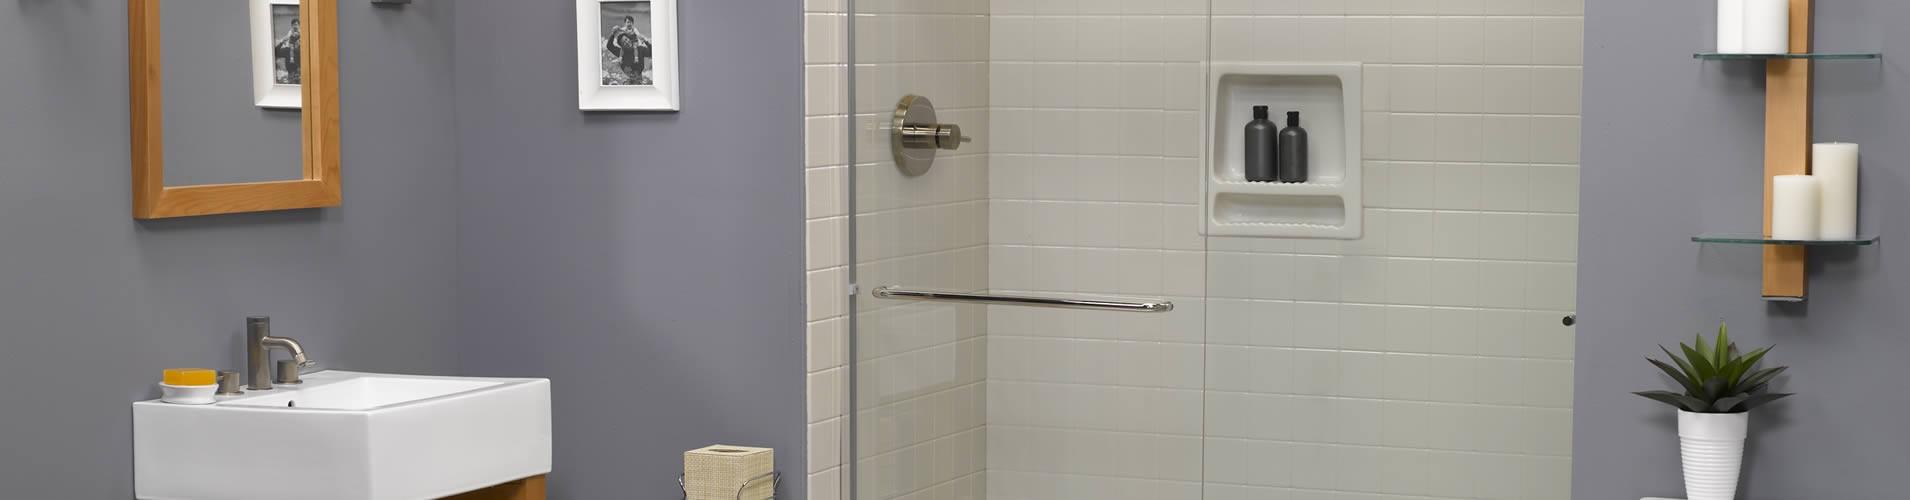 Shower Door Installations - Atlanta, Georgia